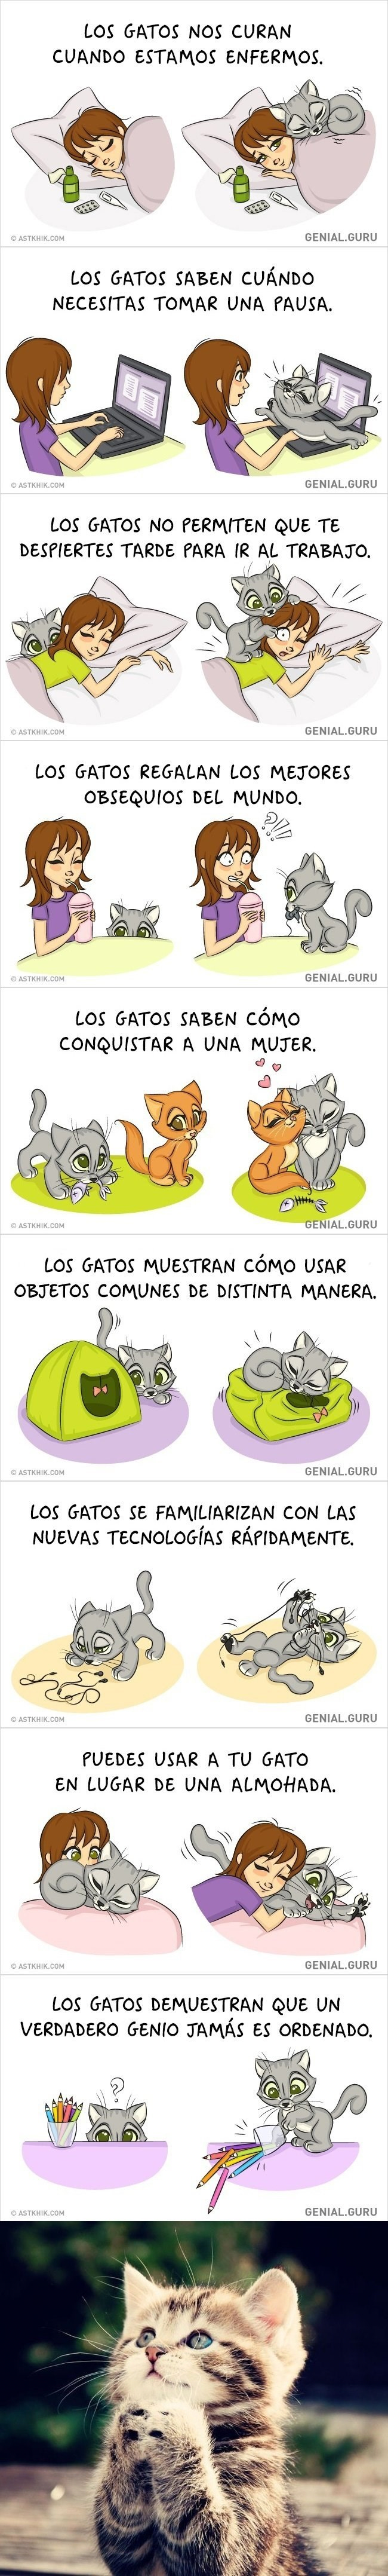 necesitas un gato